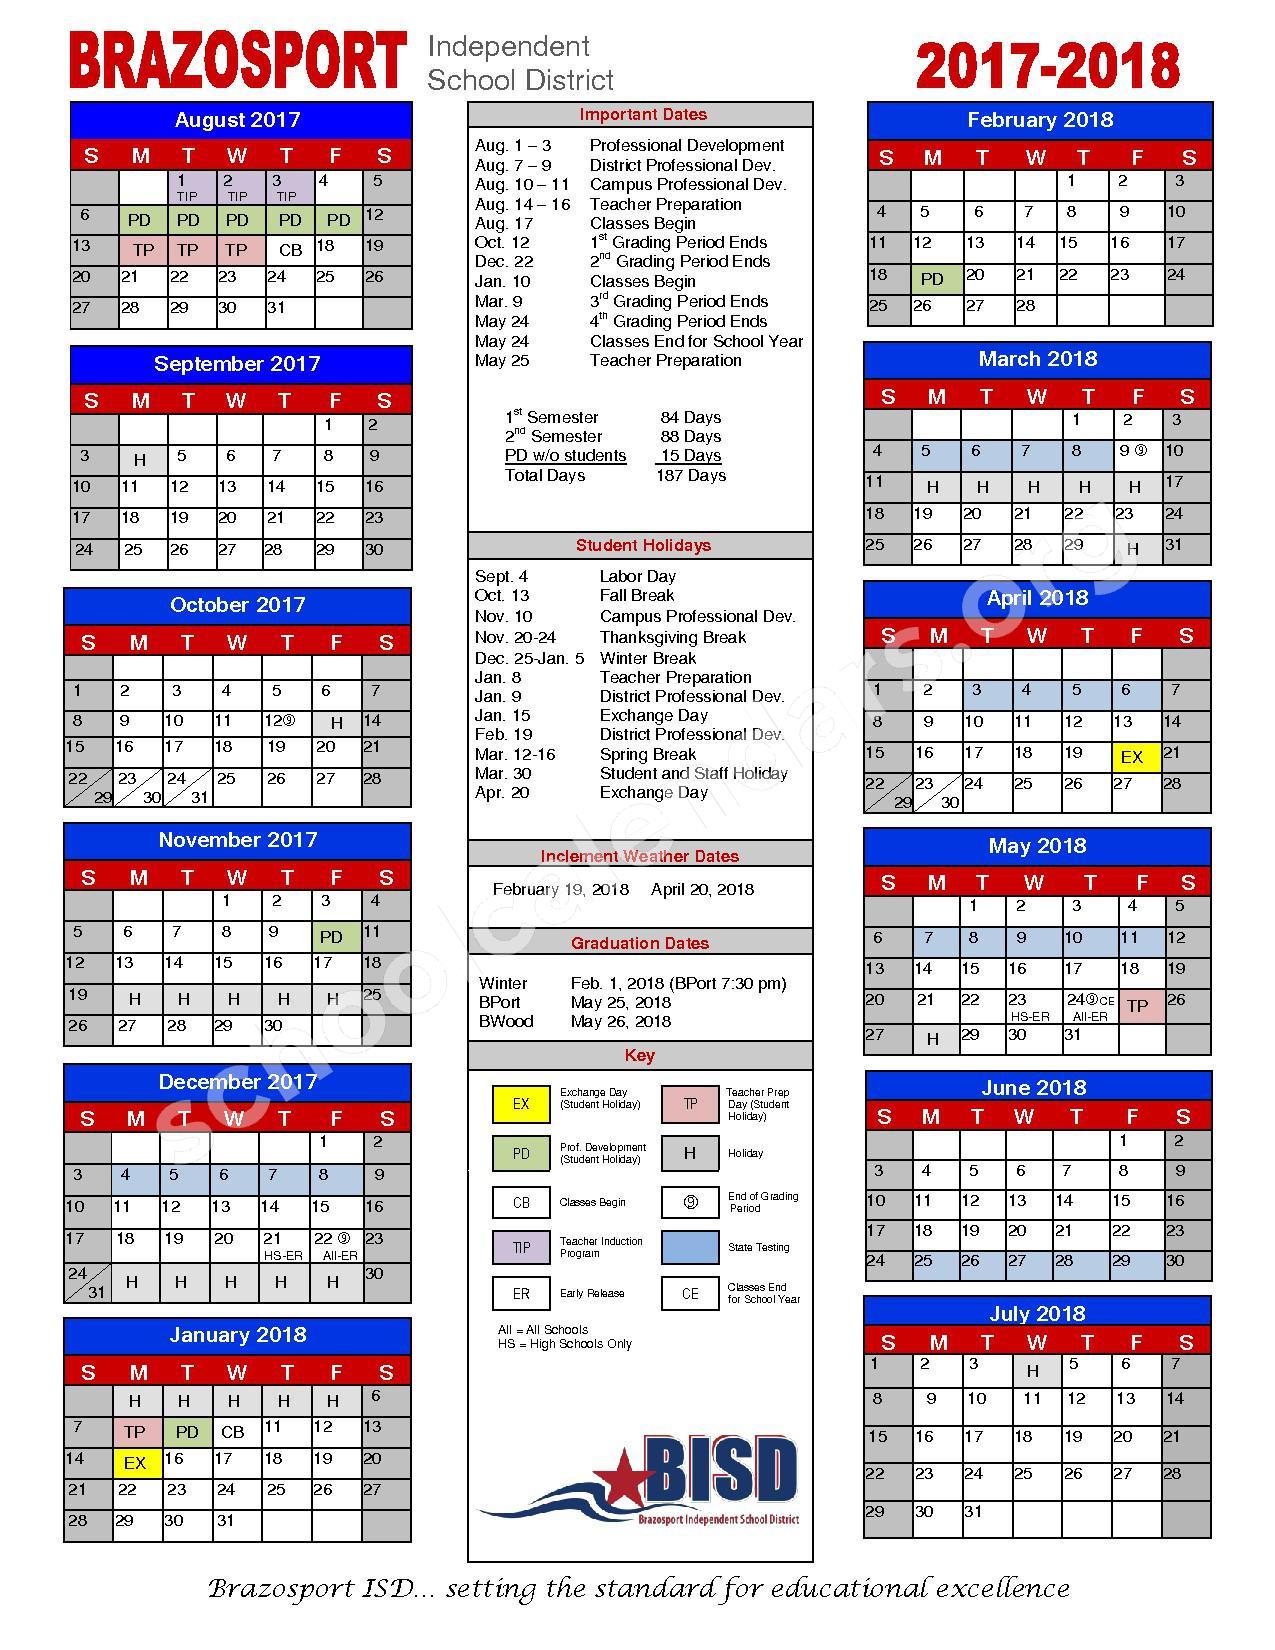 2017 - 2018 School Calendar – Brazosport Independent School District – page 1